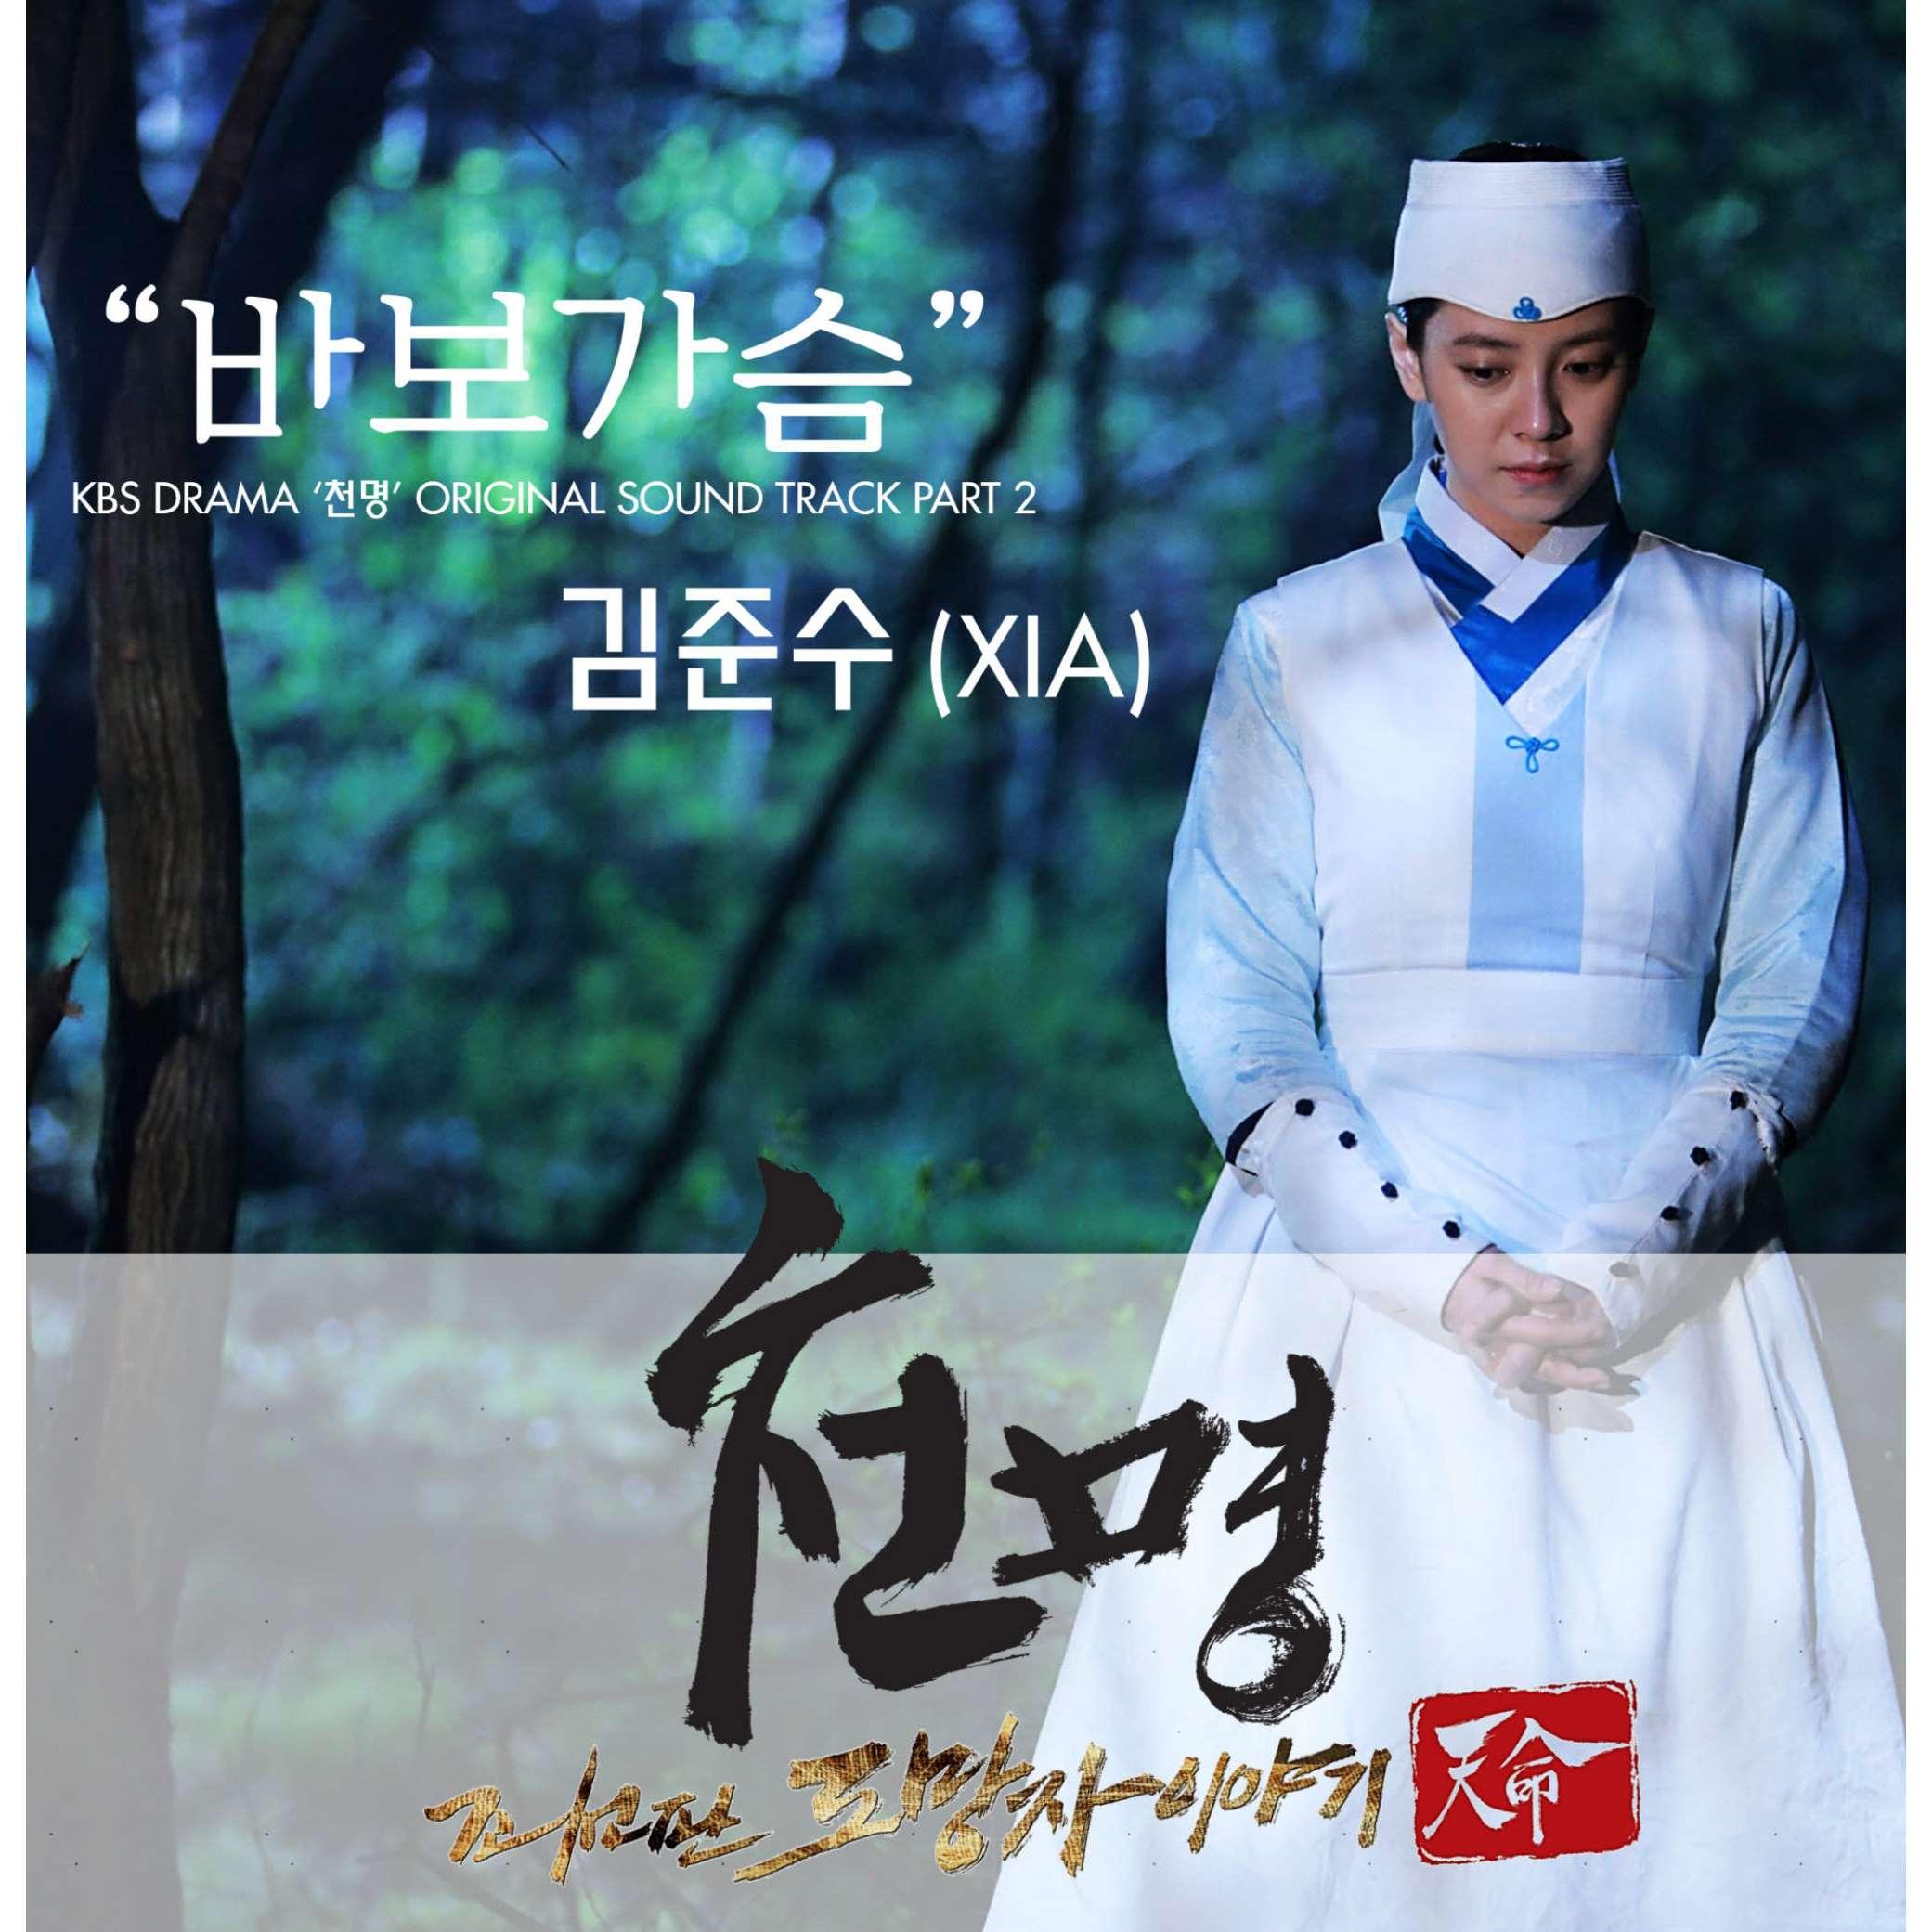 [Single] XIA (Junsu) - Foolish Heart [Mandate of Heaven OST Part.2]